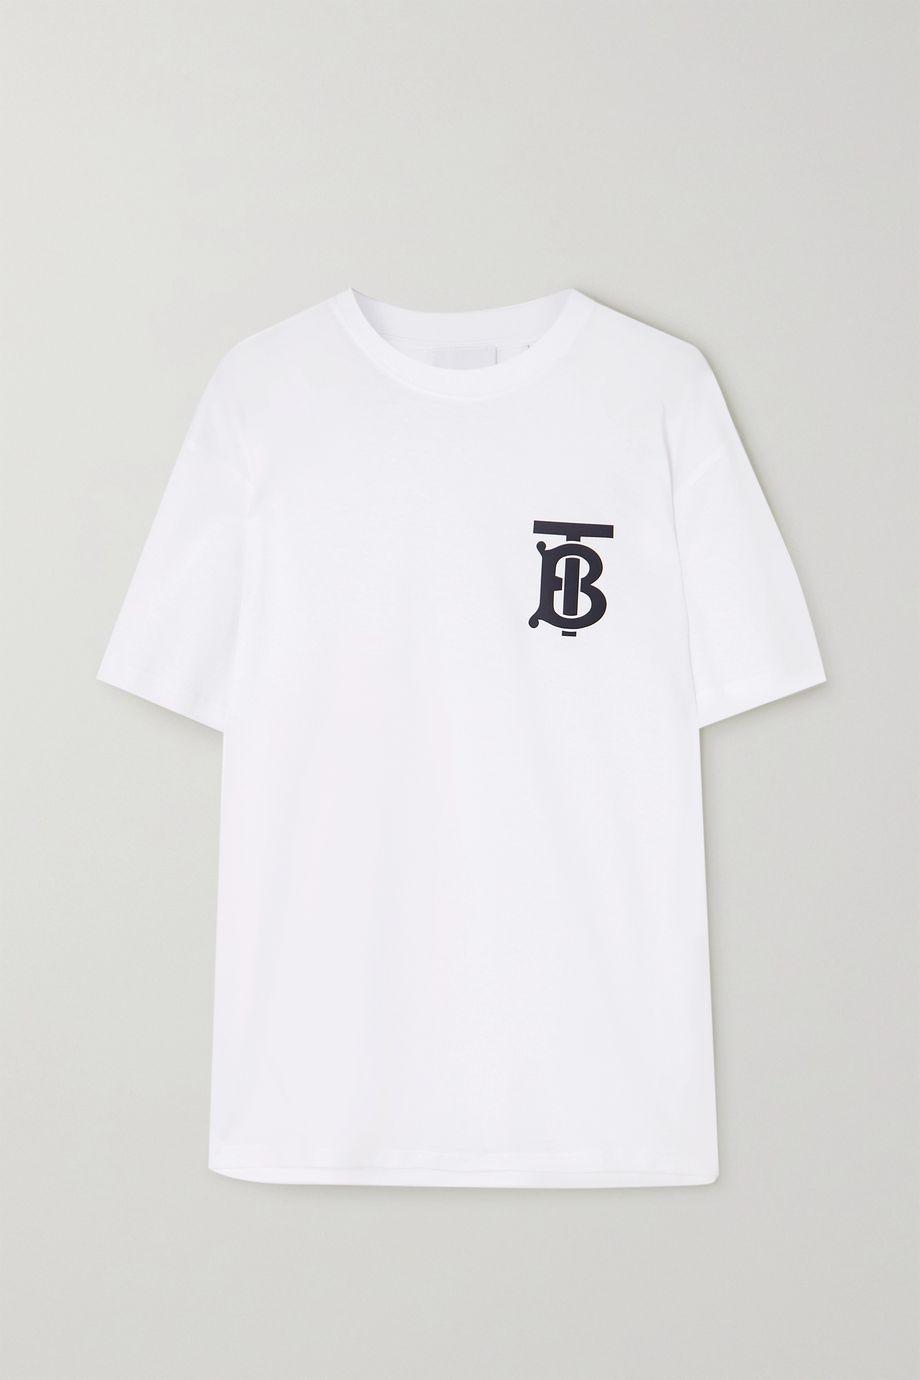 Burberry T-Shirt aus Baumwoll-Jersey mit Print